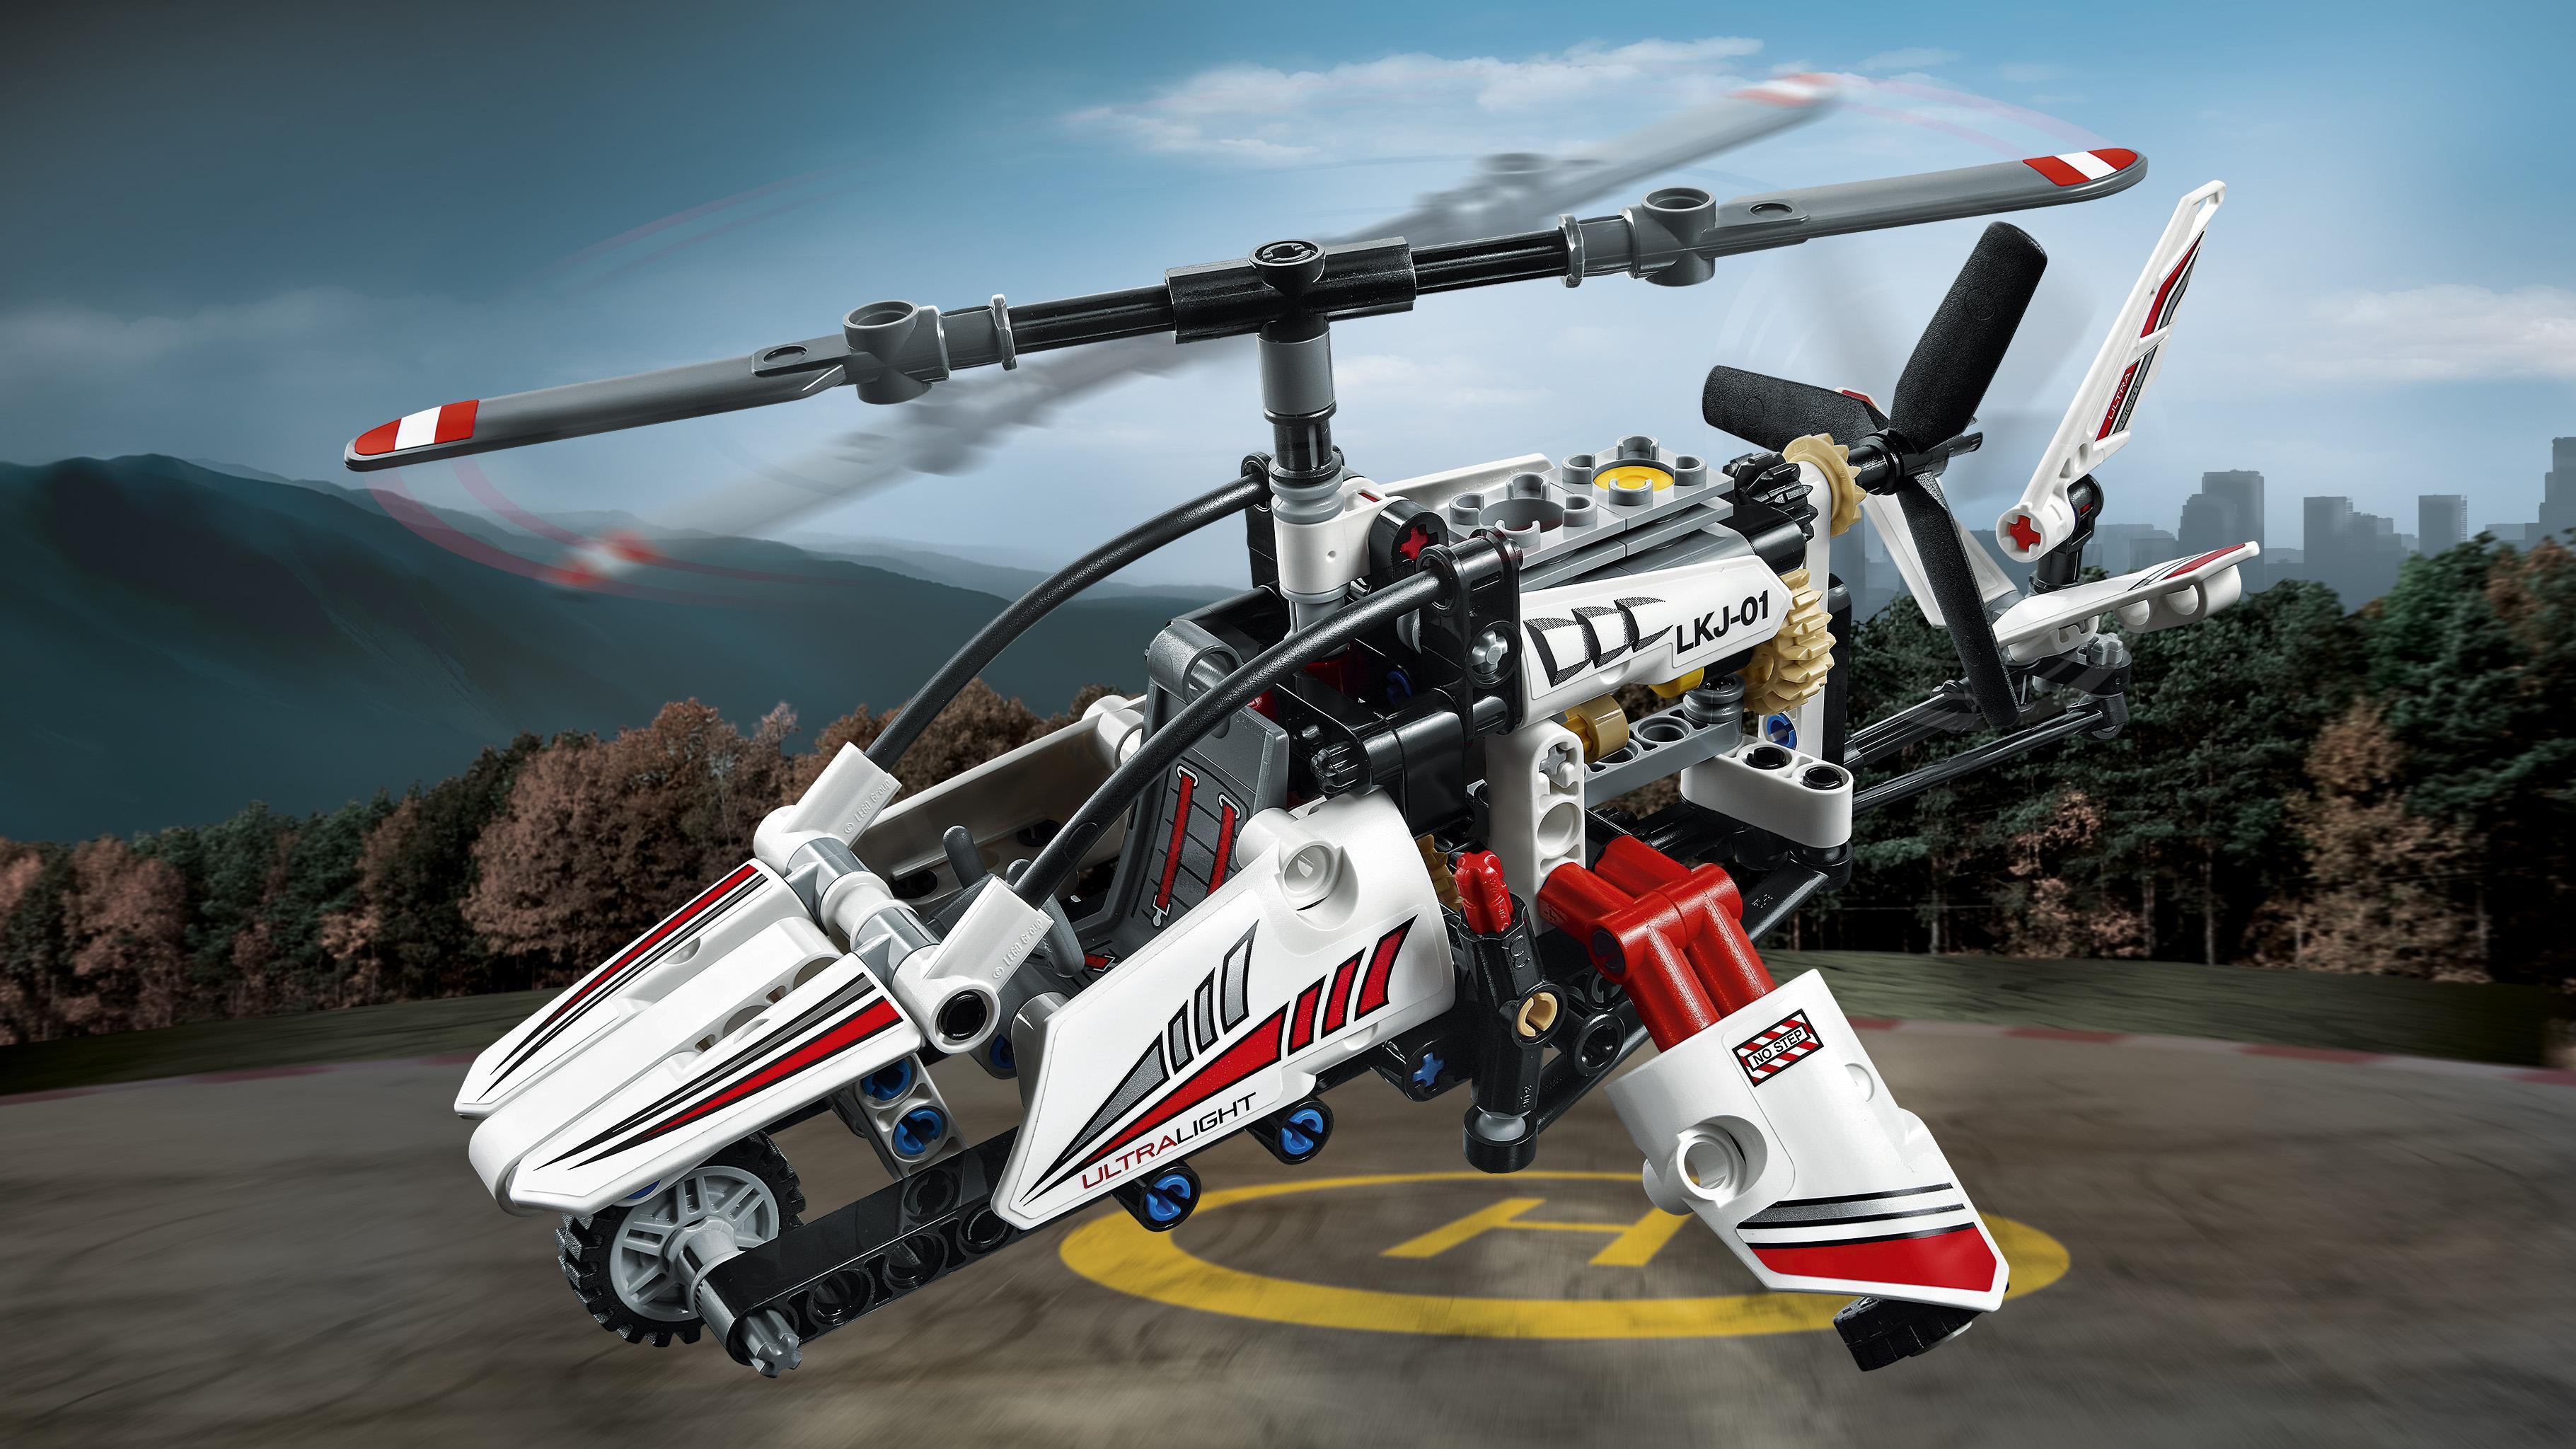 lego technic ultralight helicopter 42057 advance building set toys games. Black Bedroom Furniture Sets. Home Design Ideas